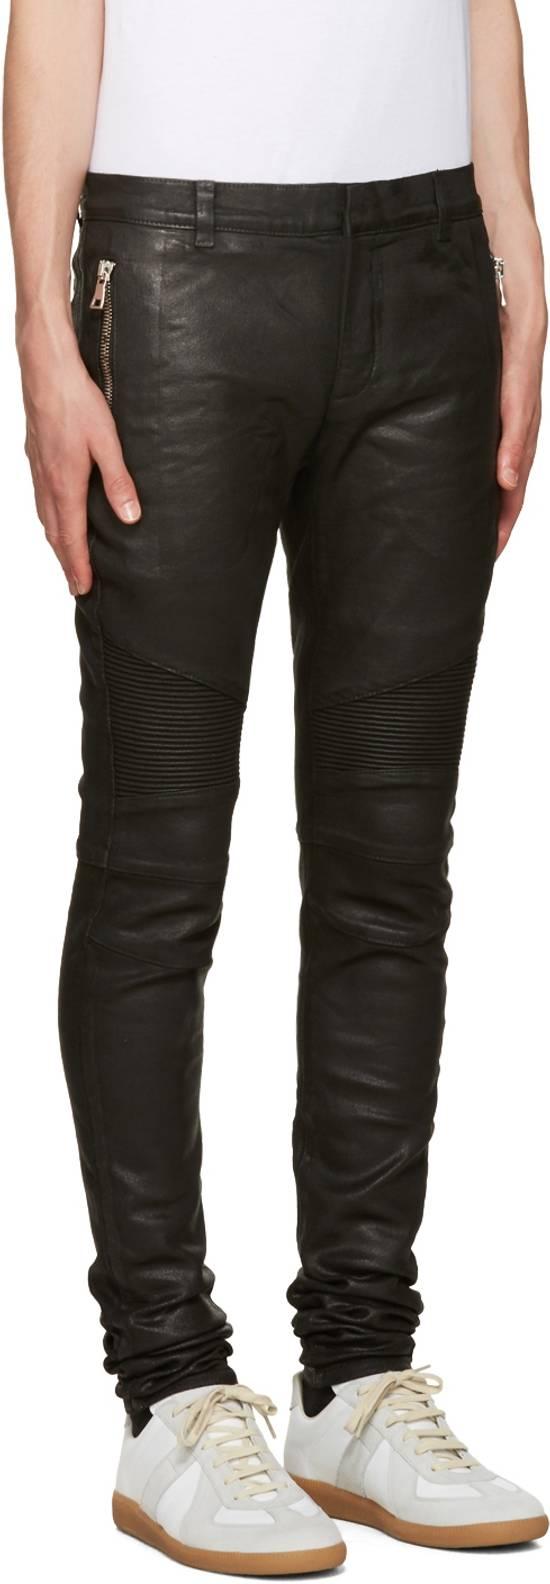 Balmain 1265$ Skinny Coated Stretch Denim Biker Jeans Size US 27